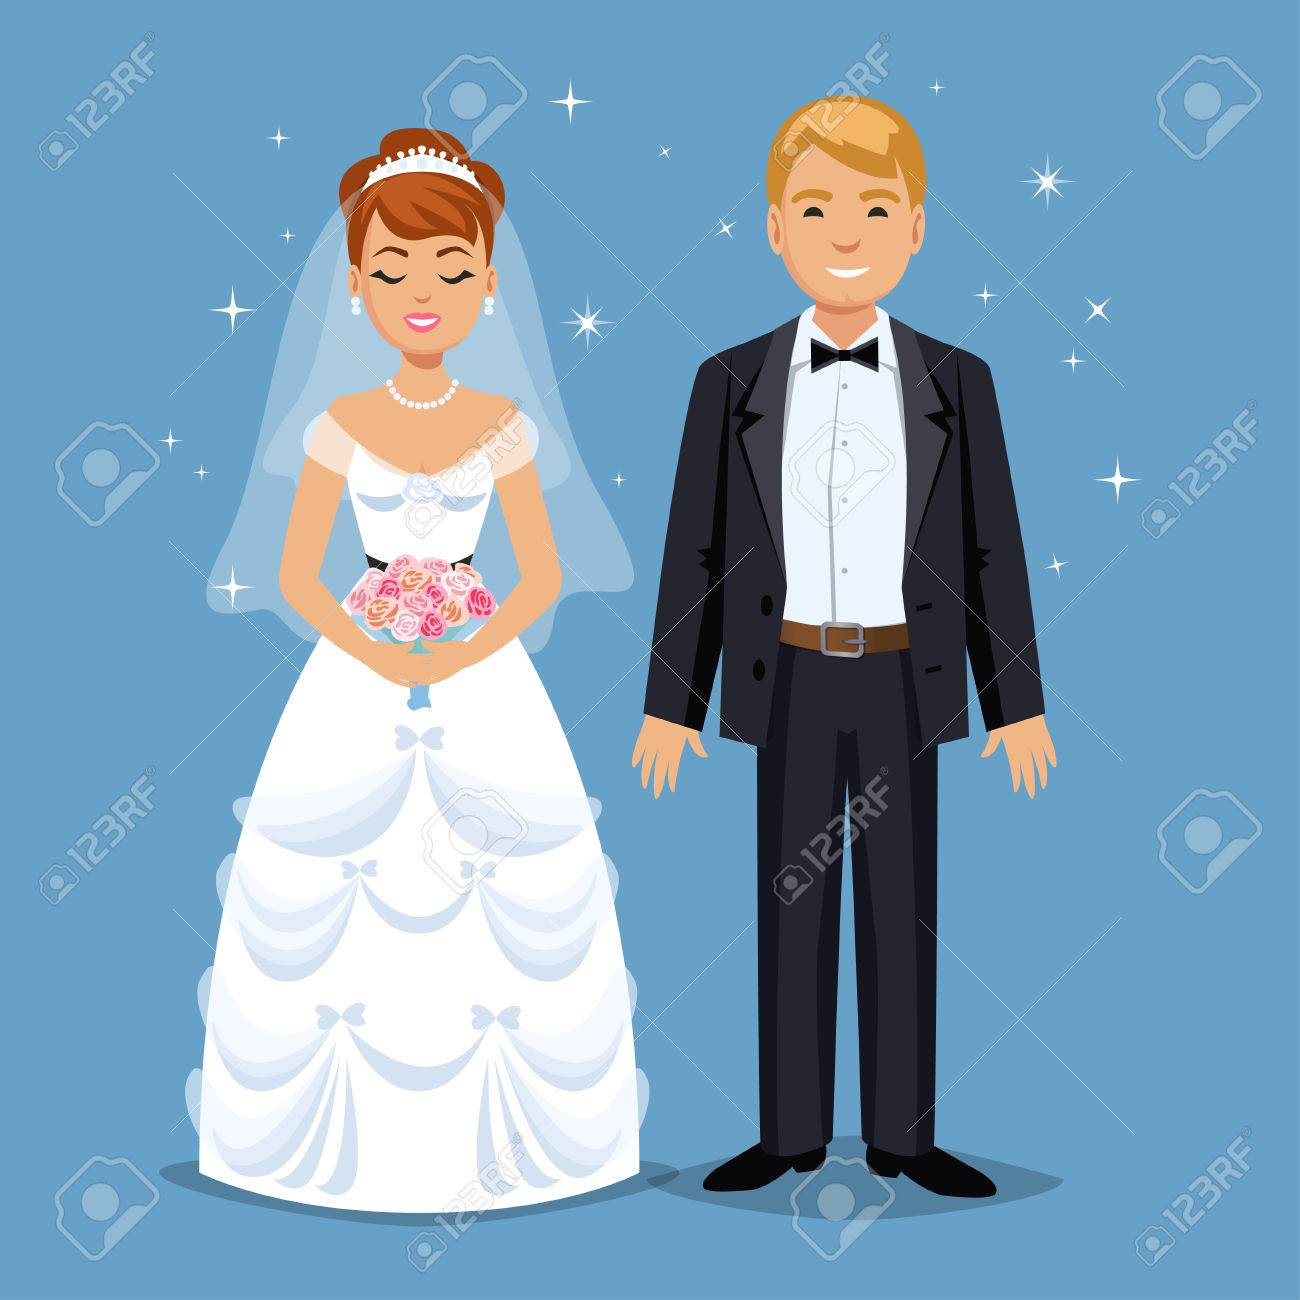 Cute Bride and groom, Wedding Party set illustration. Cartoon Wedding people couple. Vector illustration - 53256236